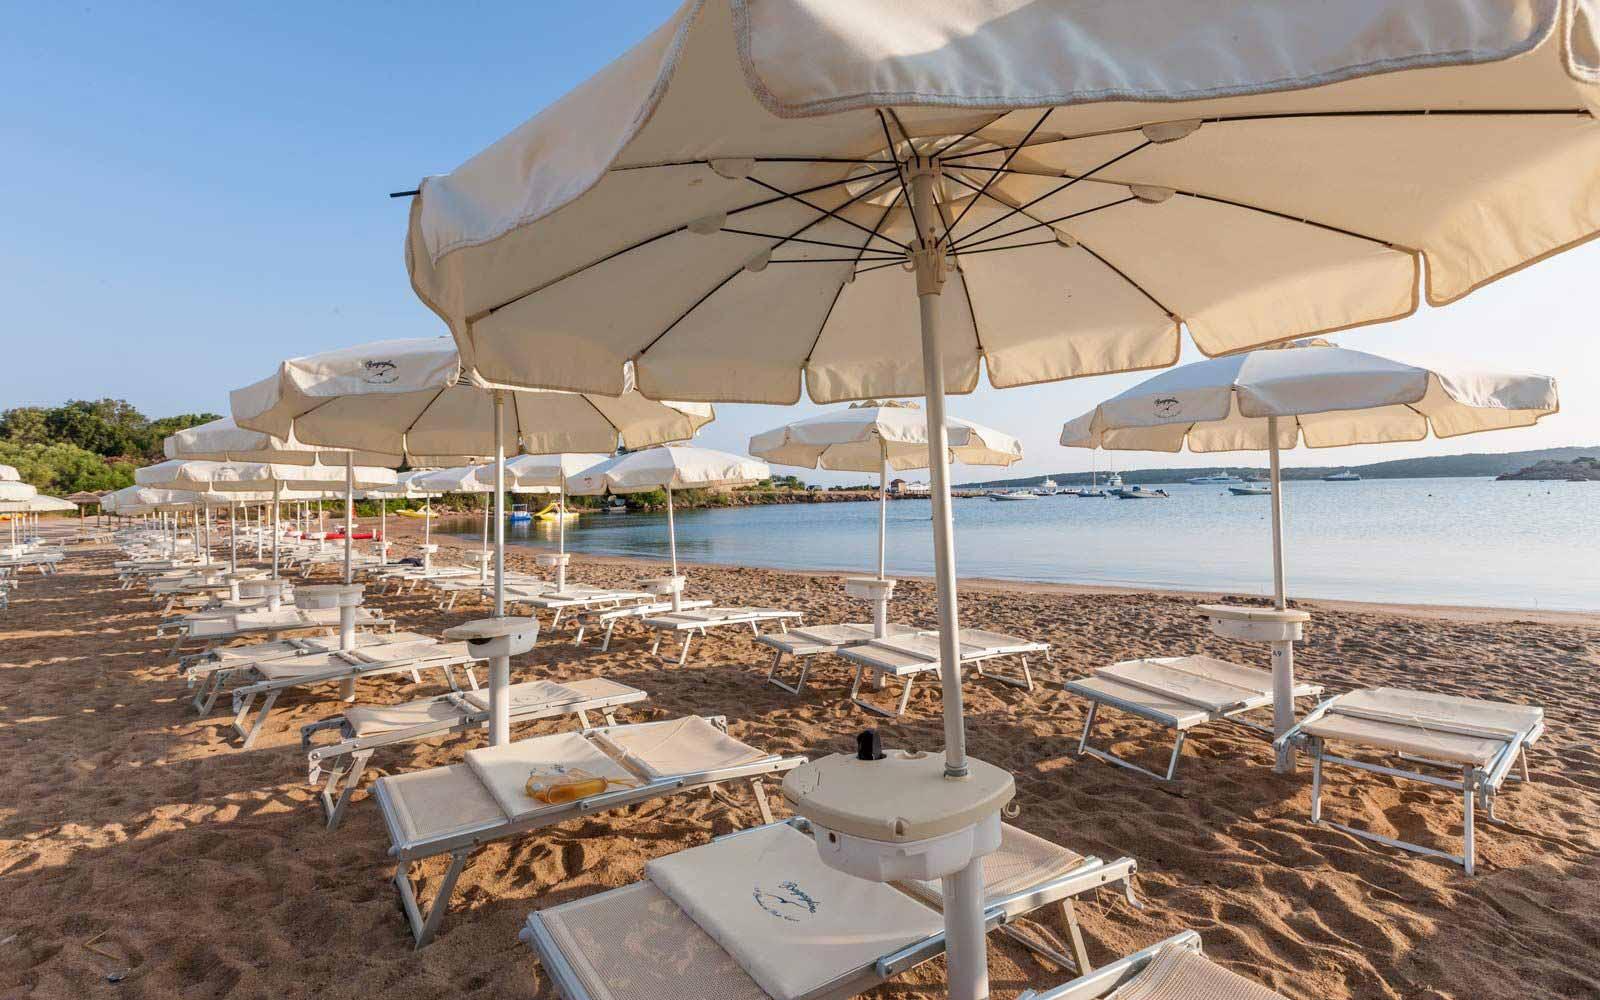 Sun loungers on the beach at Hotel Le Palme